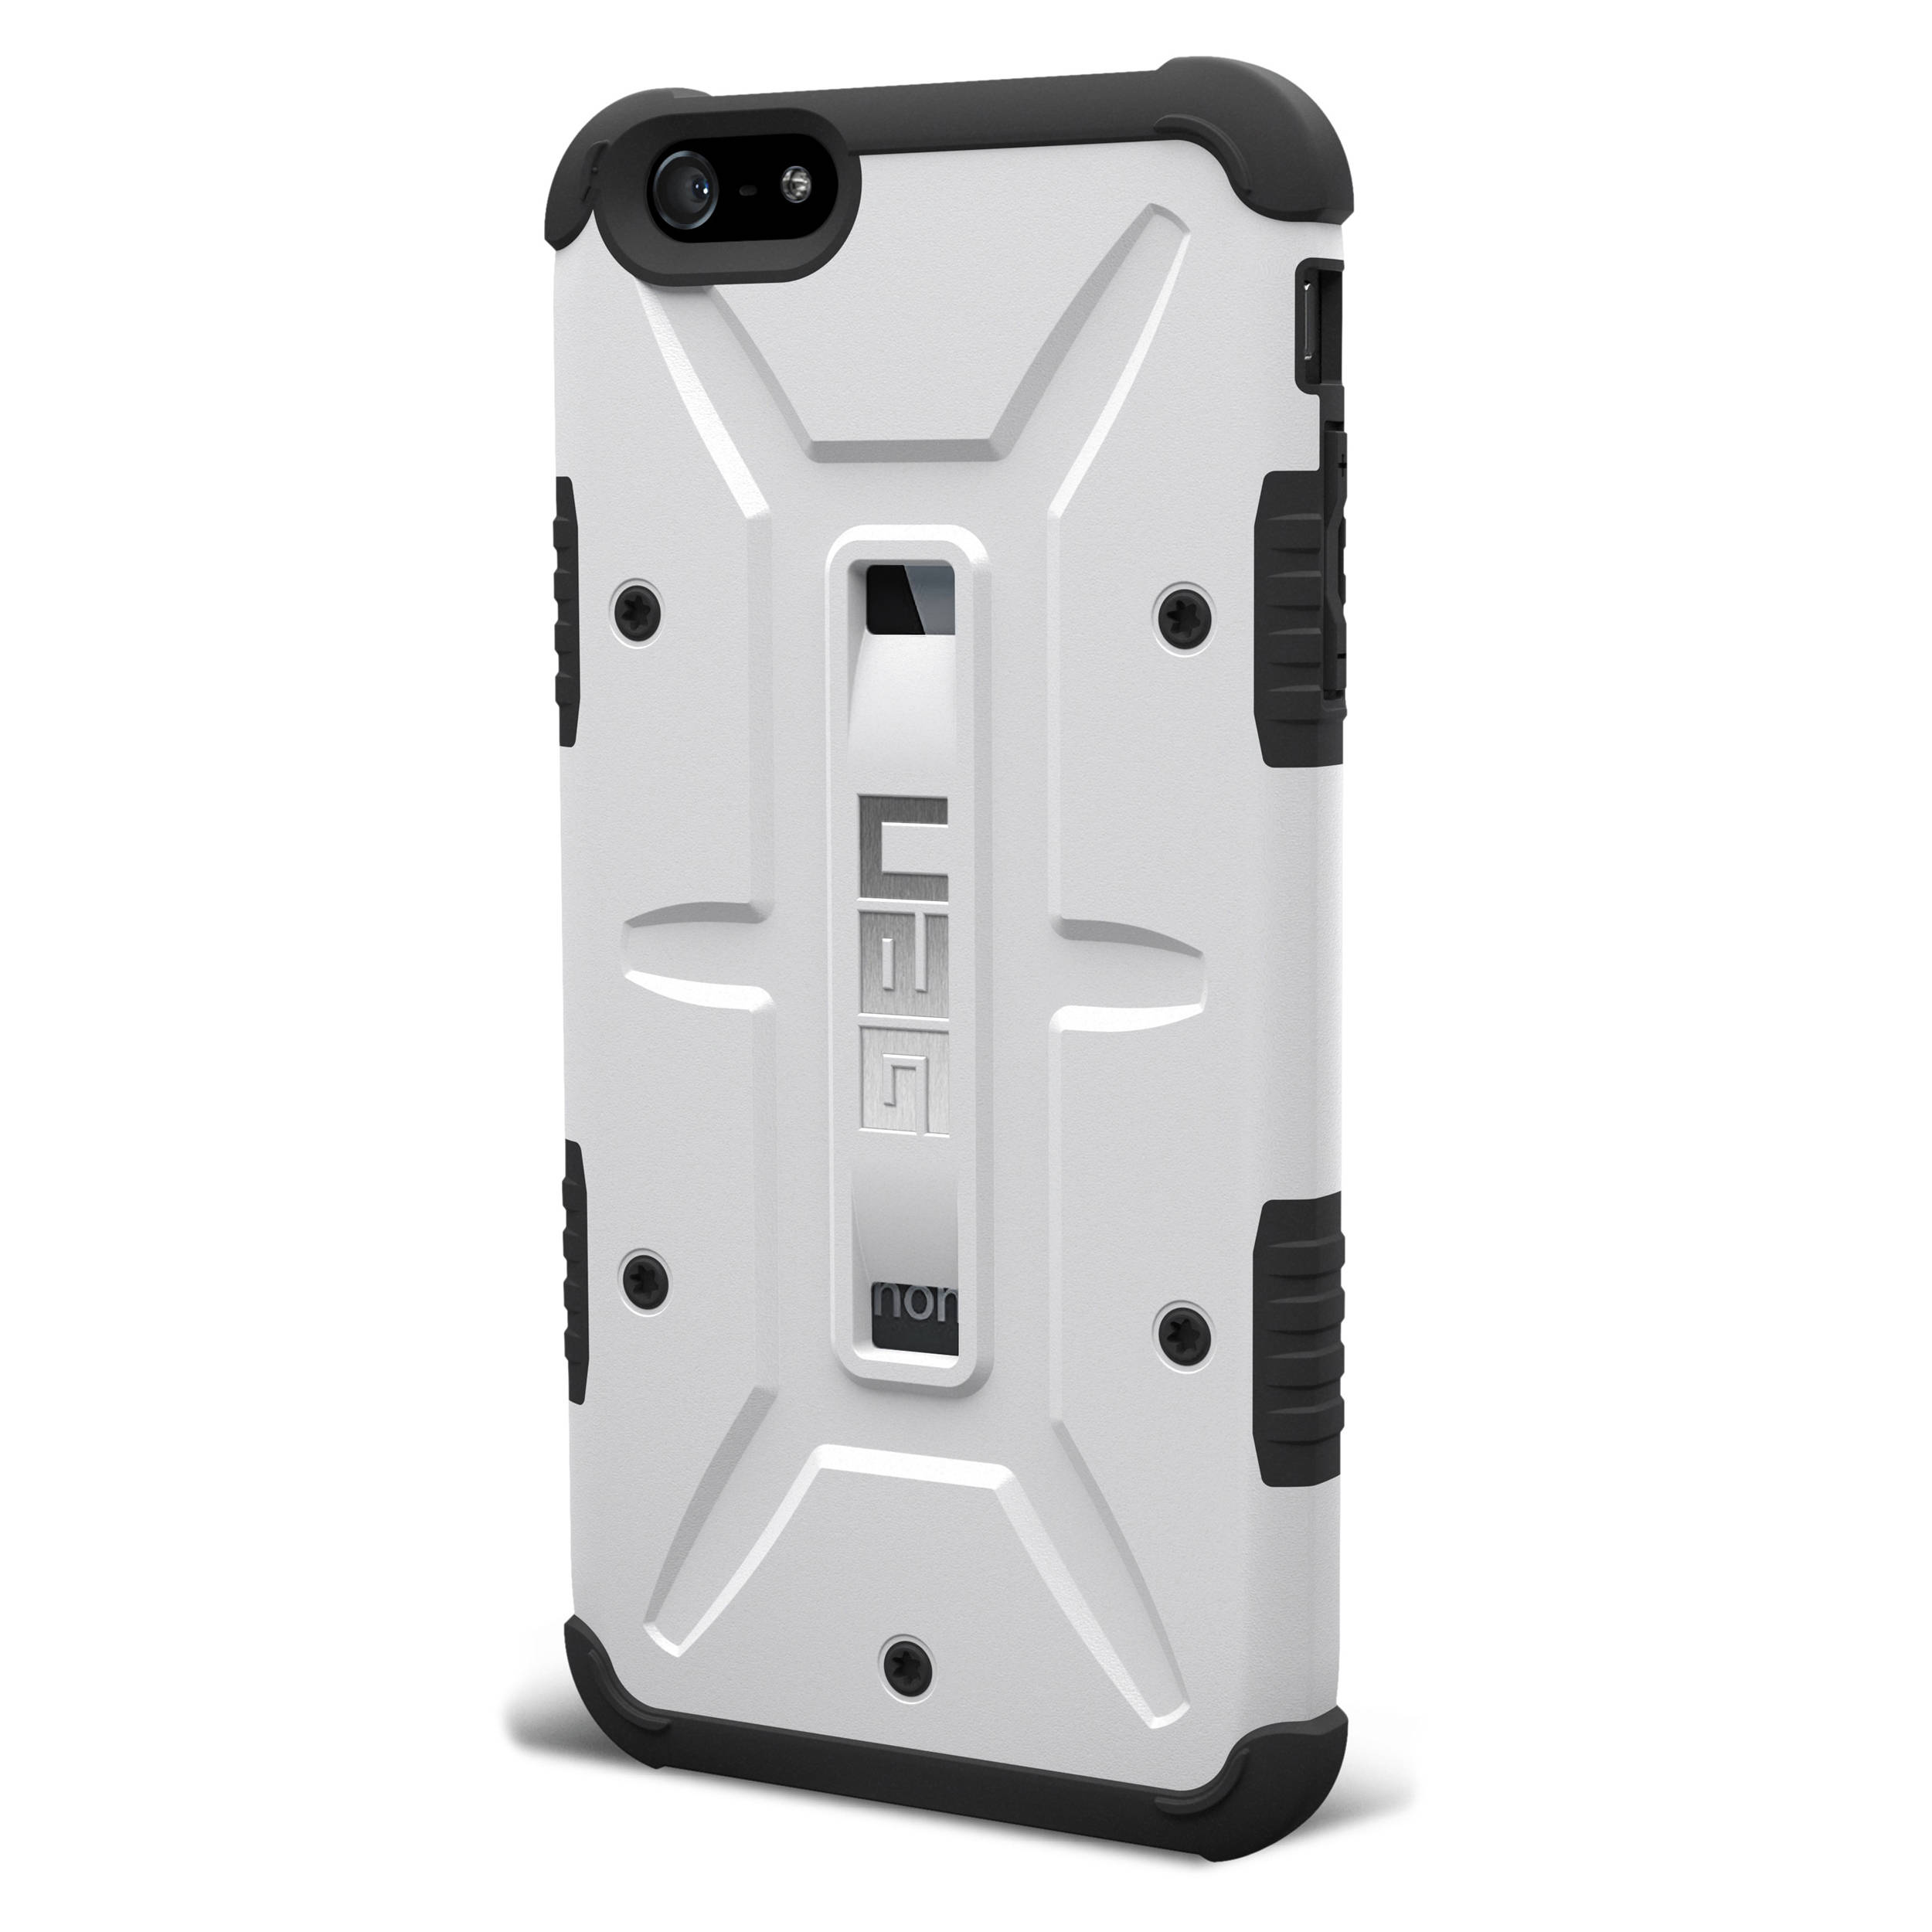 quality design 480b3 0b7d0 Urban Armor Gear Composite Case for iPhone 6 Plus/6s Plus (White)